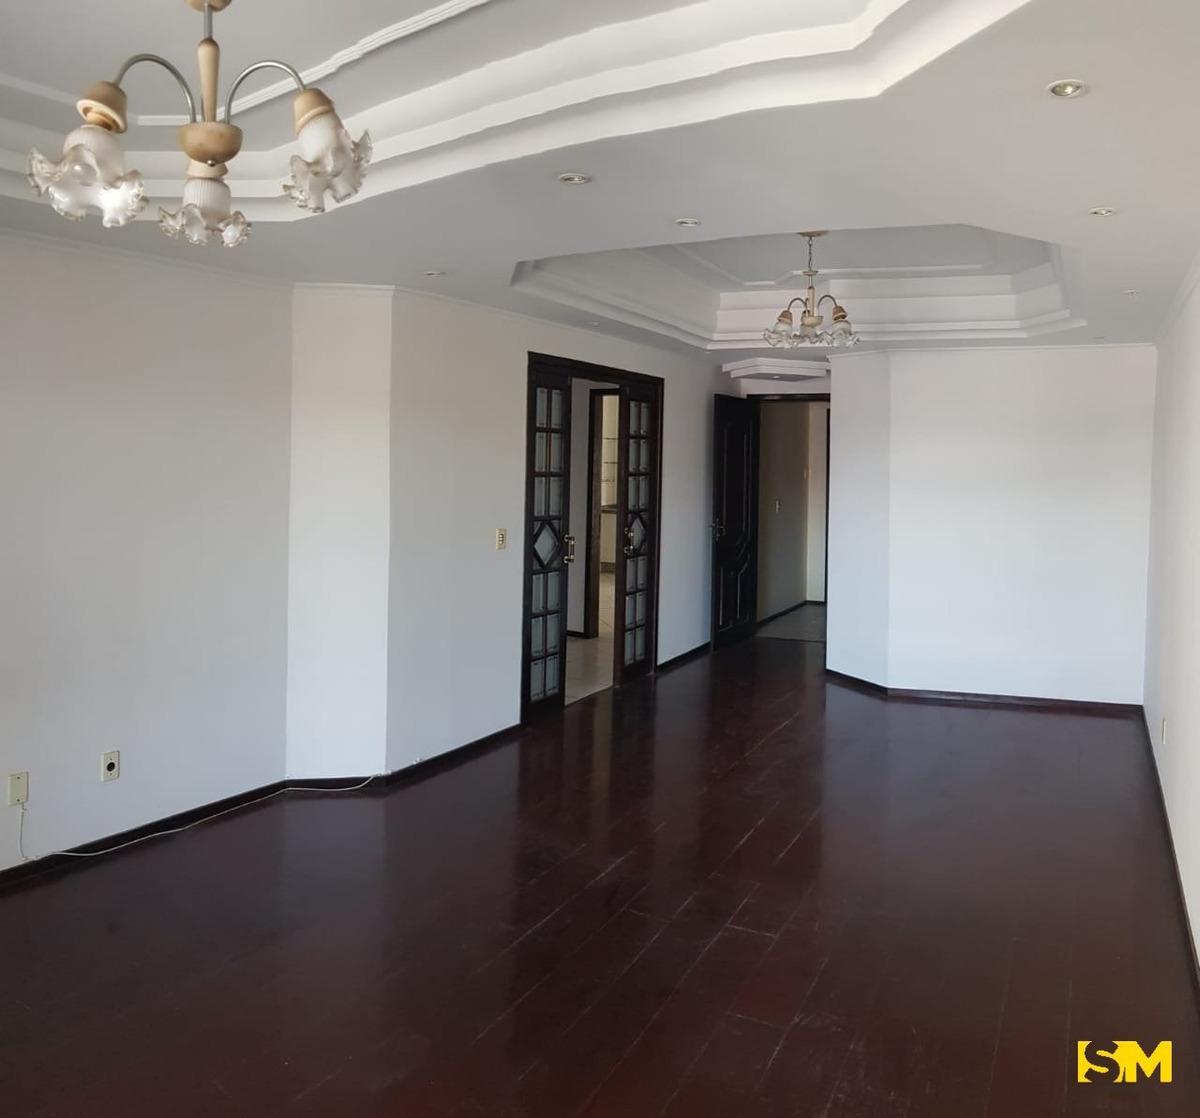 casa - guanabara - ref: 54 - l-sm54